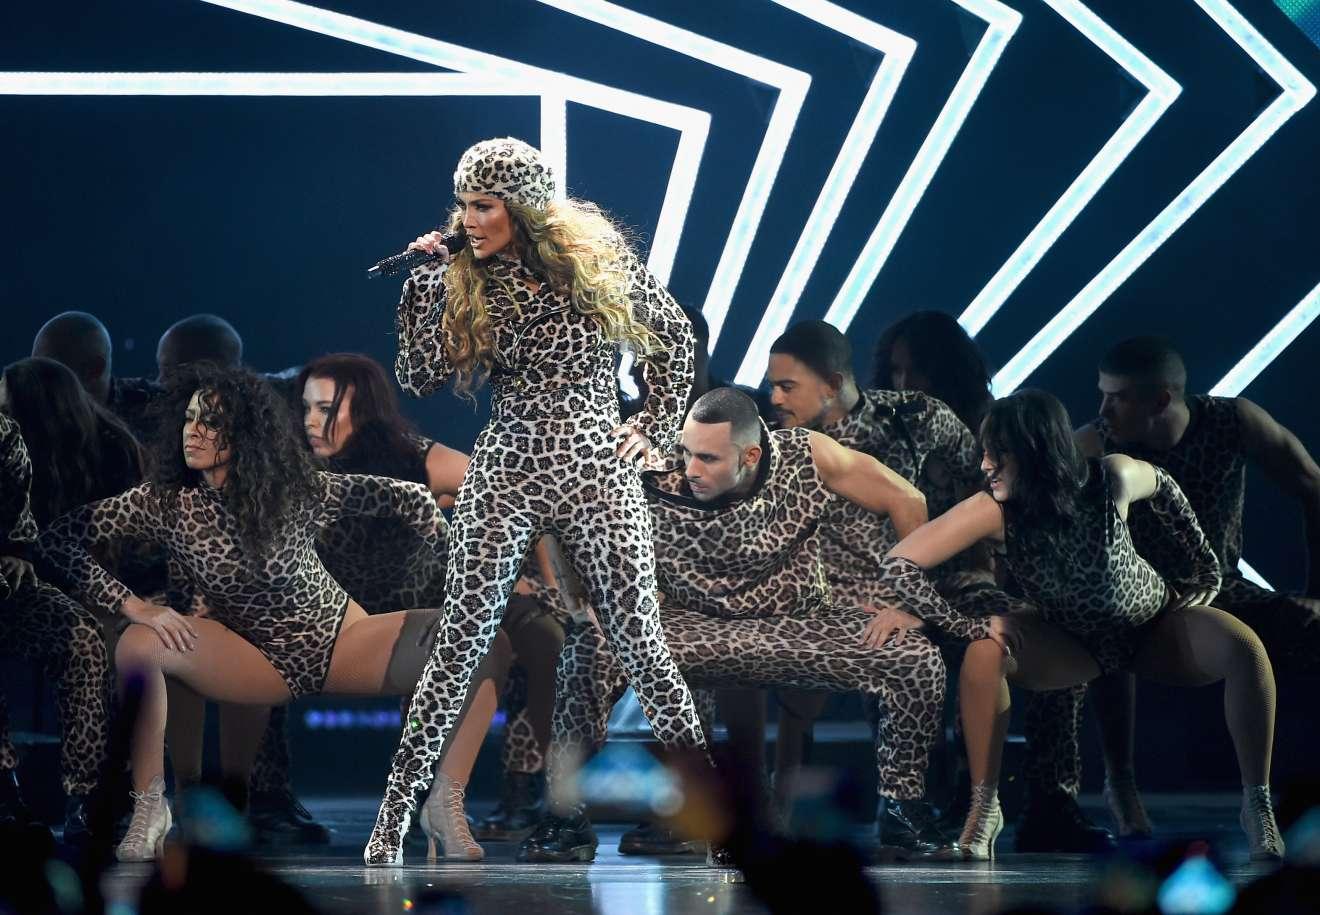 Jennifer Lopez 2018 : Jennifer Lopez: 2018 DIRECTV NOW Super Saturday Night Concert in Minneapolis-15